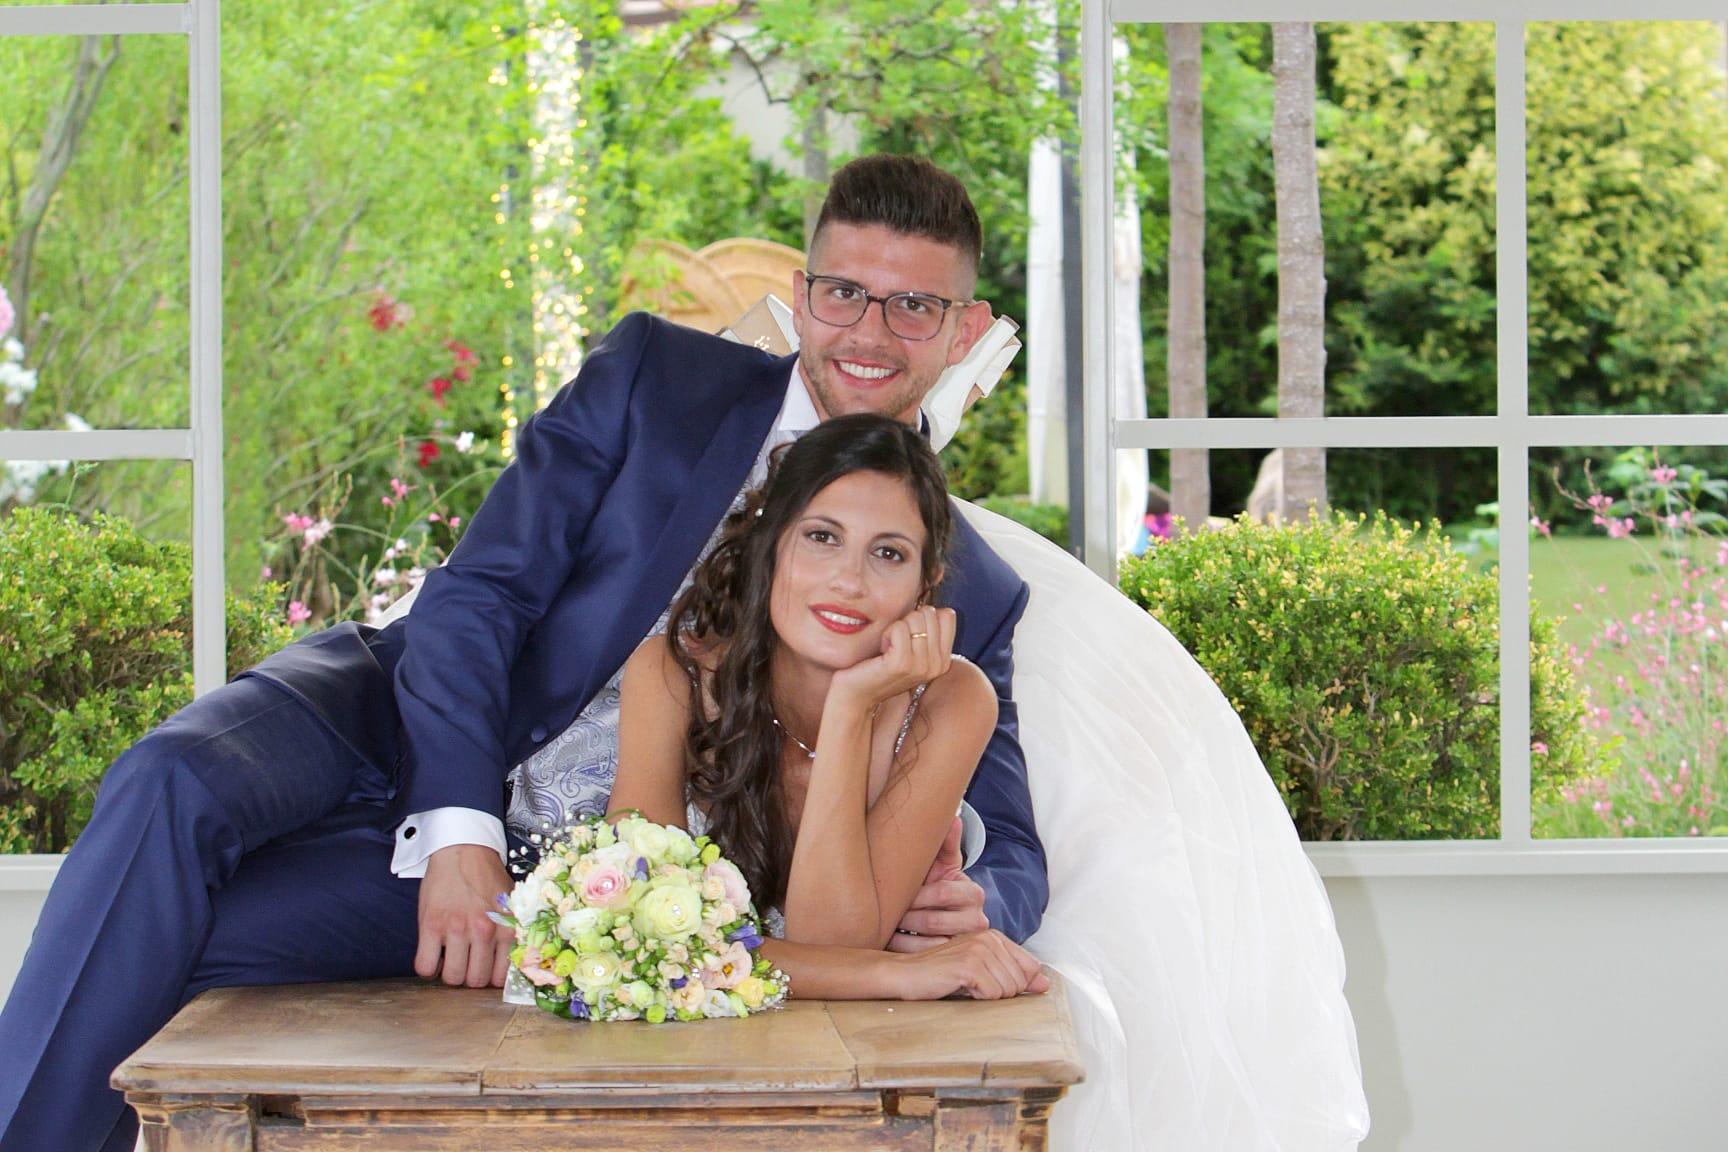 Matrimonio Matteo & Erika a Palazzo Gambara - San Vito (BS) - L'Uomo Griffe Boutique